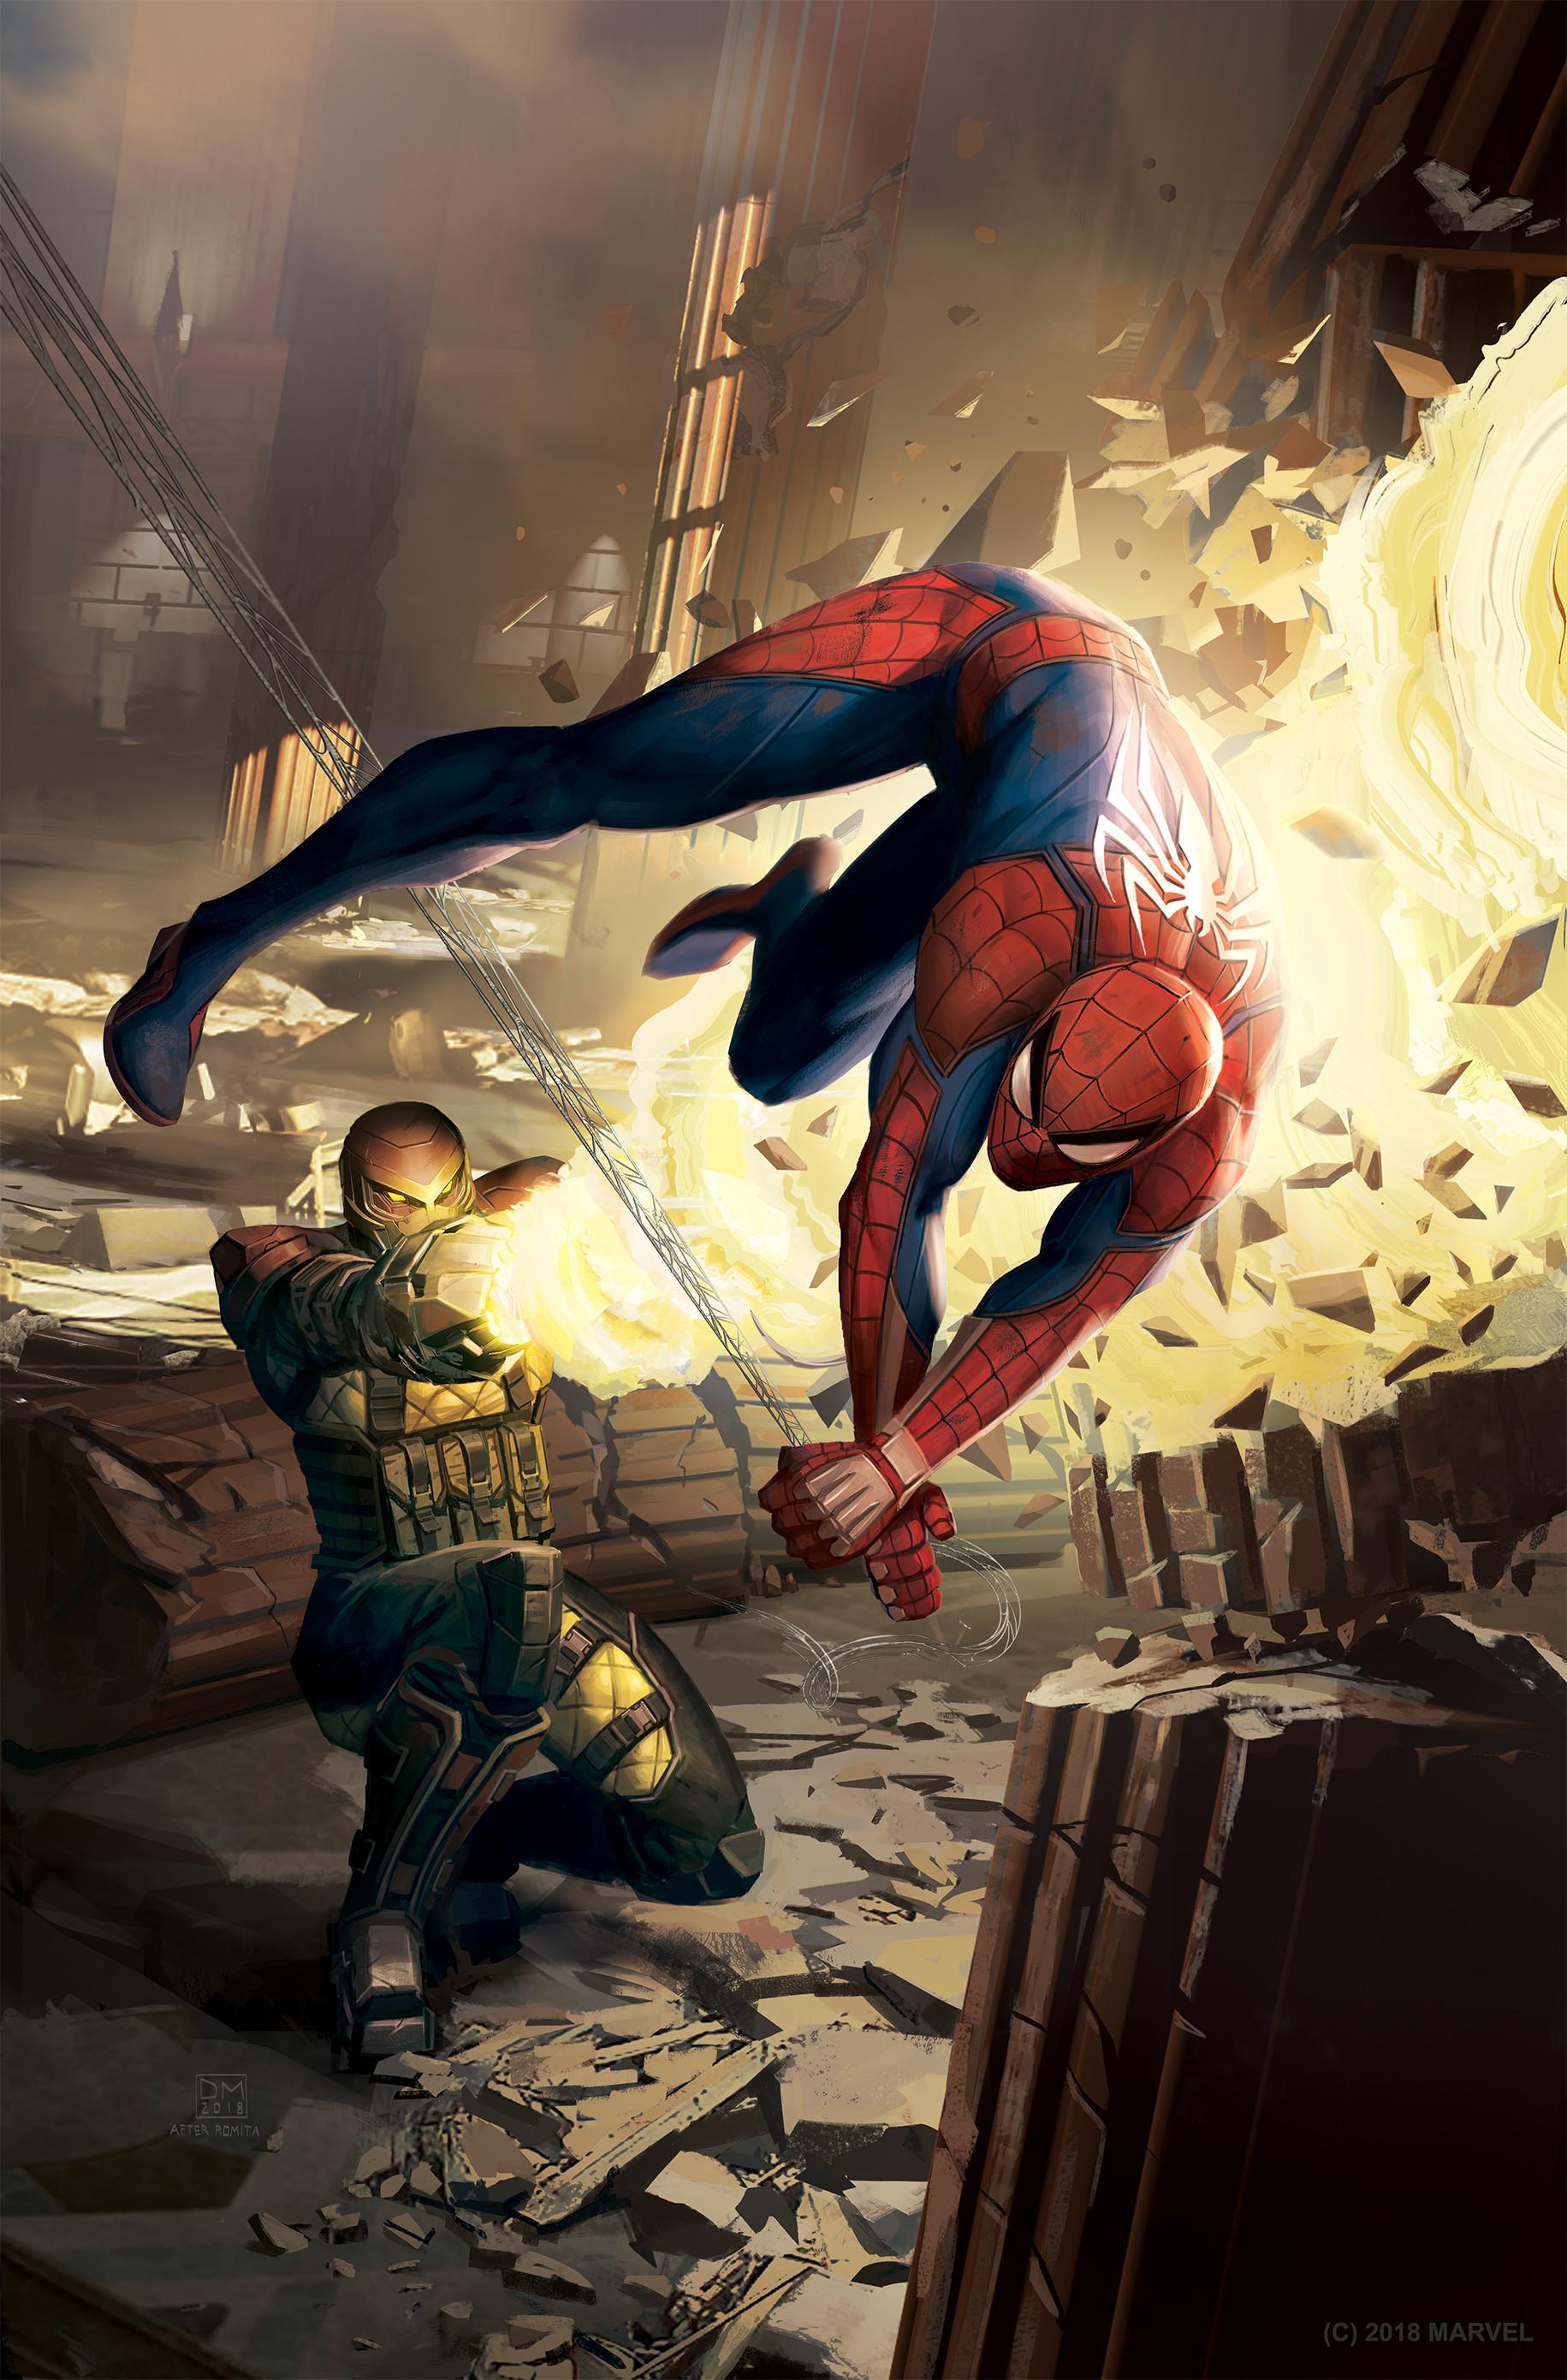 Daryl mandryk spidermanps4cover